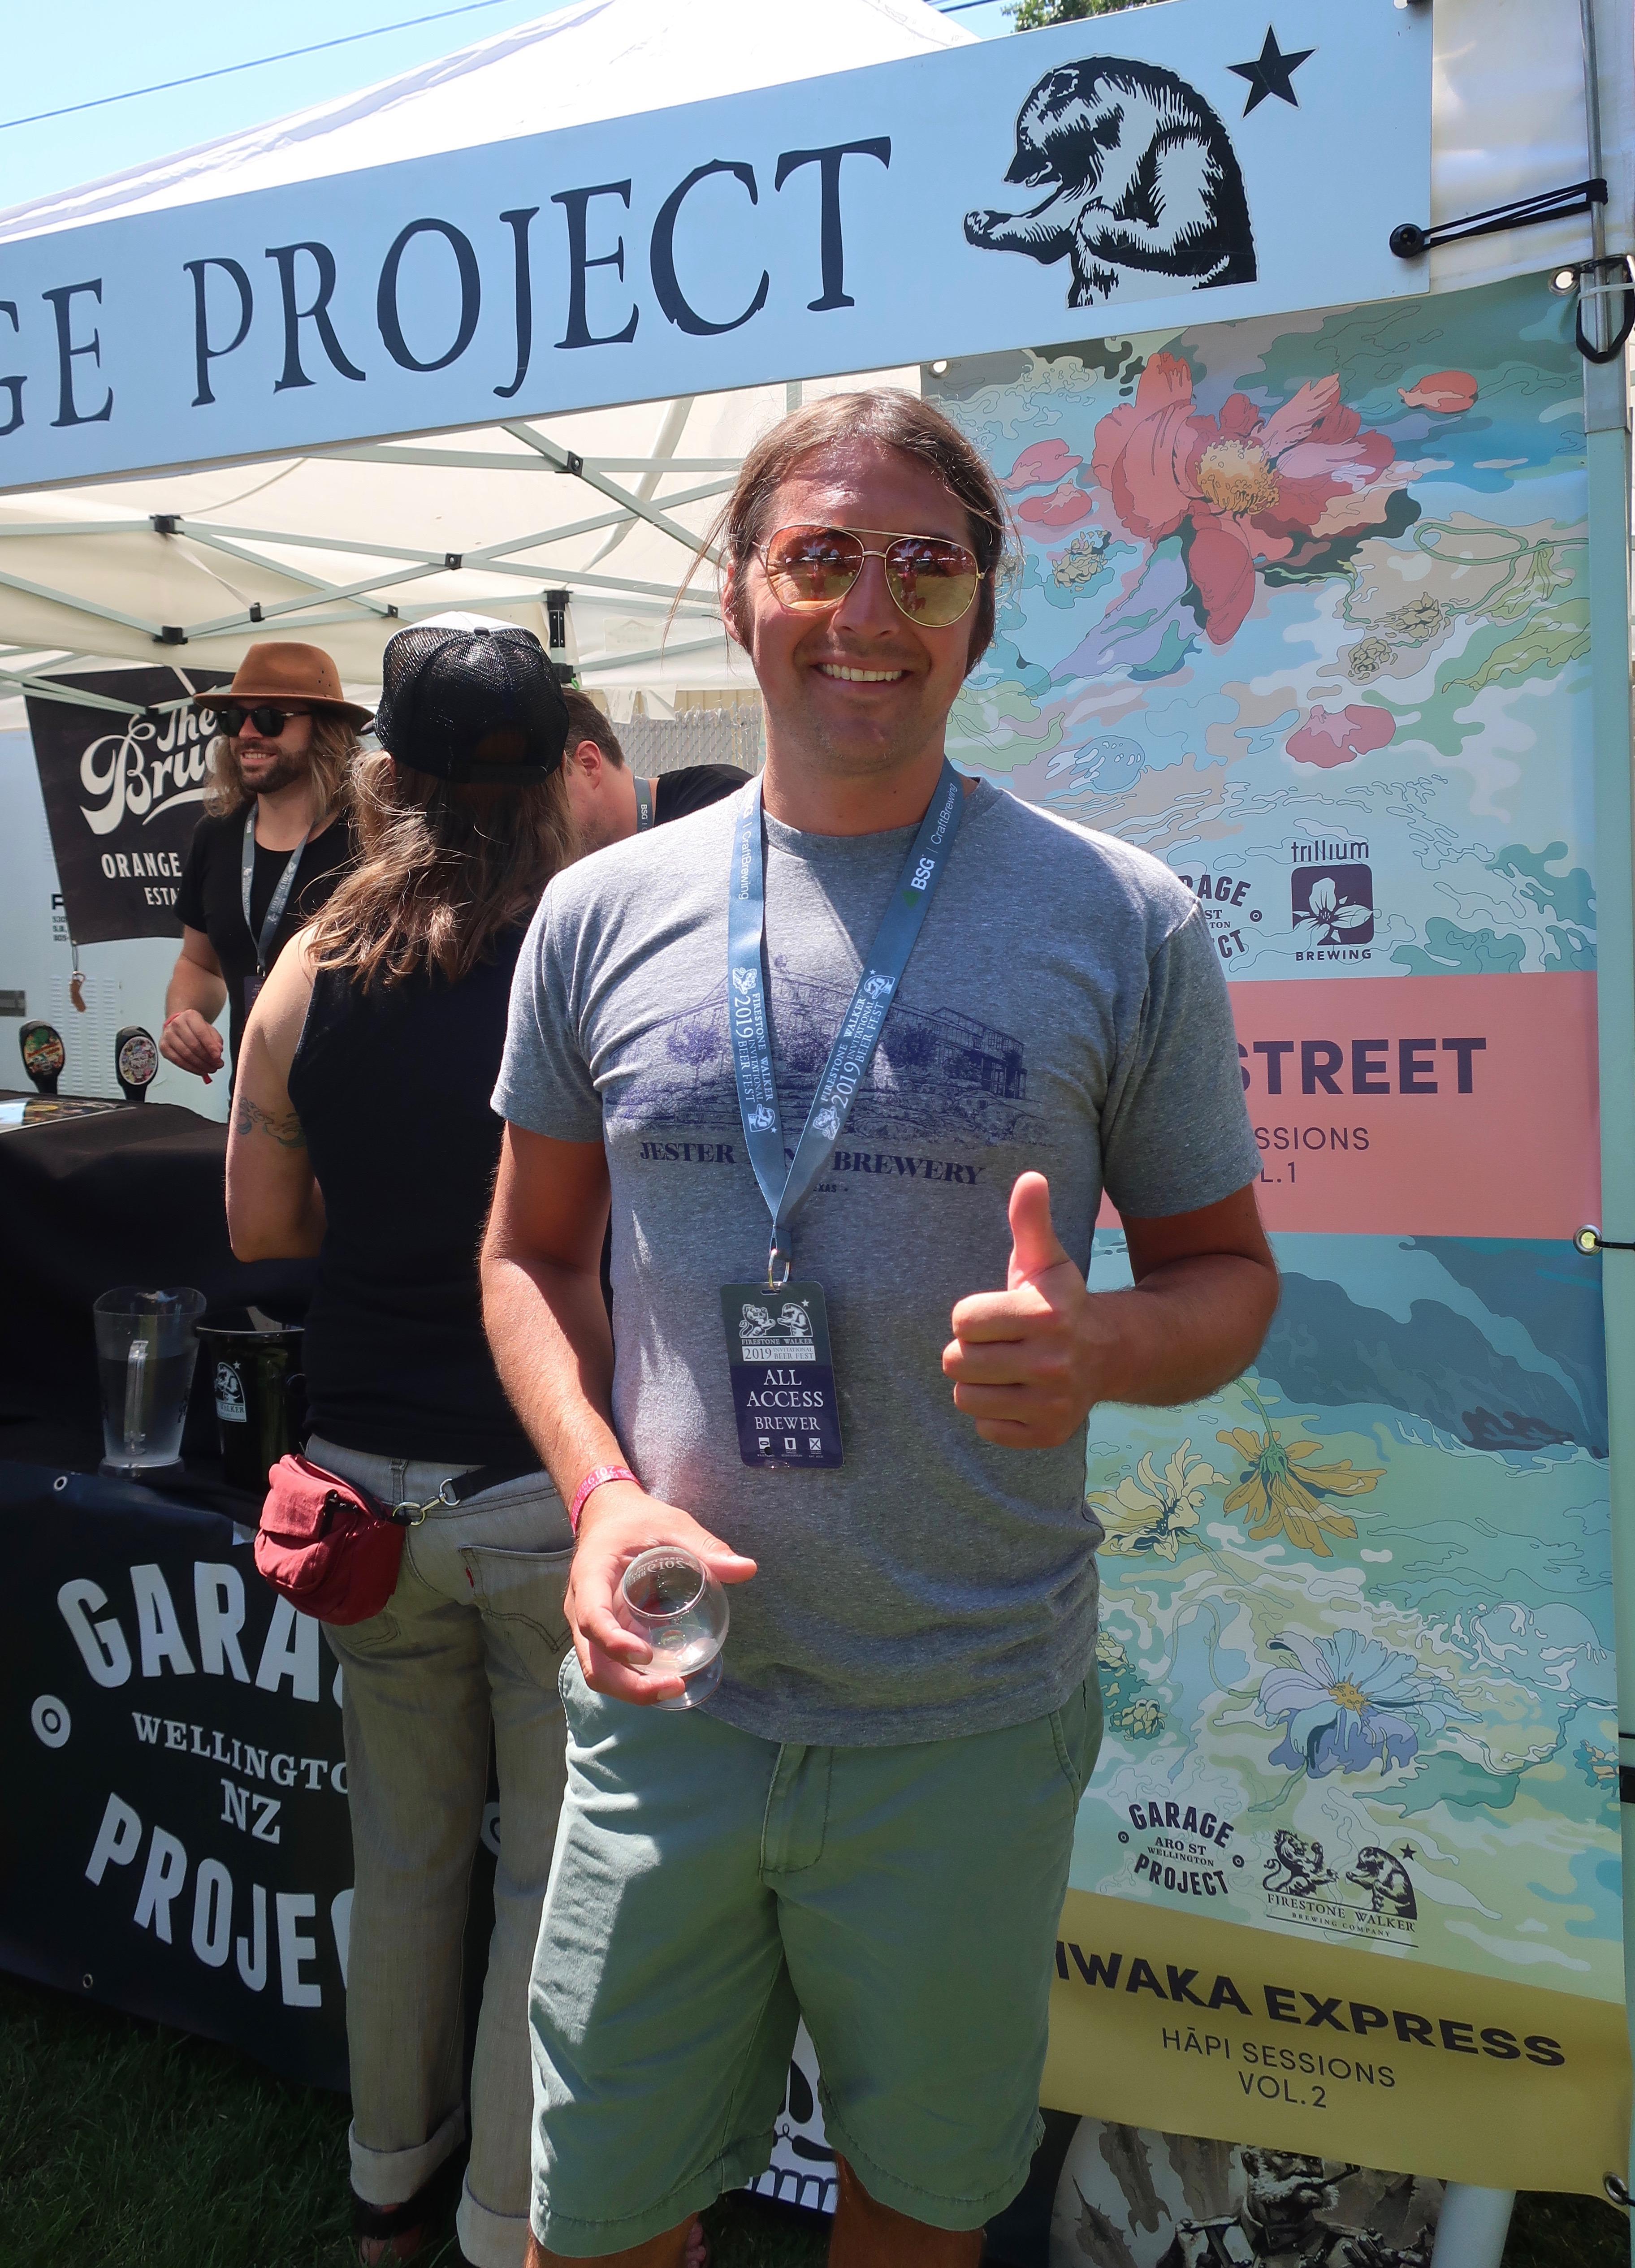 Travis Sandoval attends his first Firestone Walker Invitational Beer Fest volunteering for Jester King.